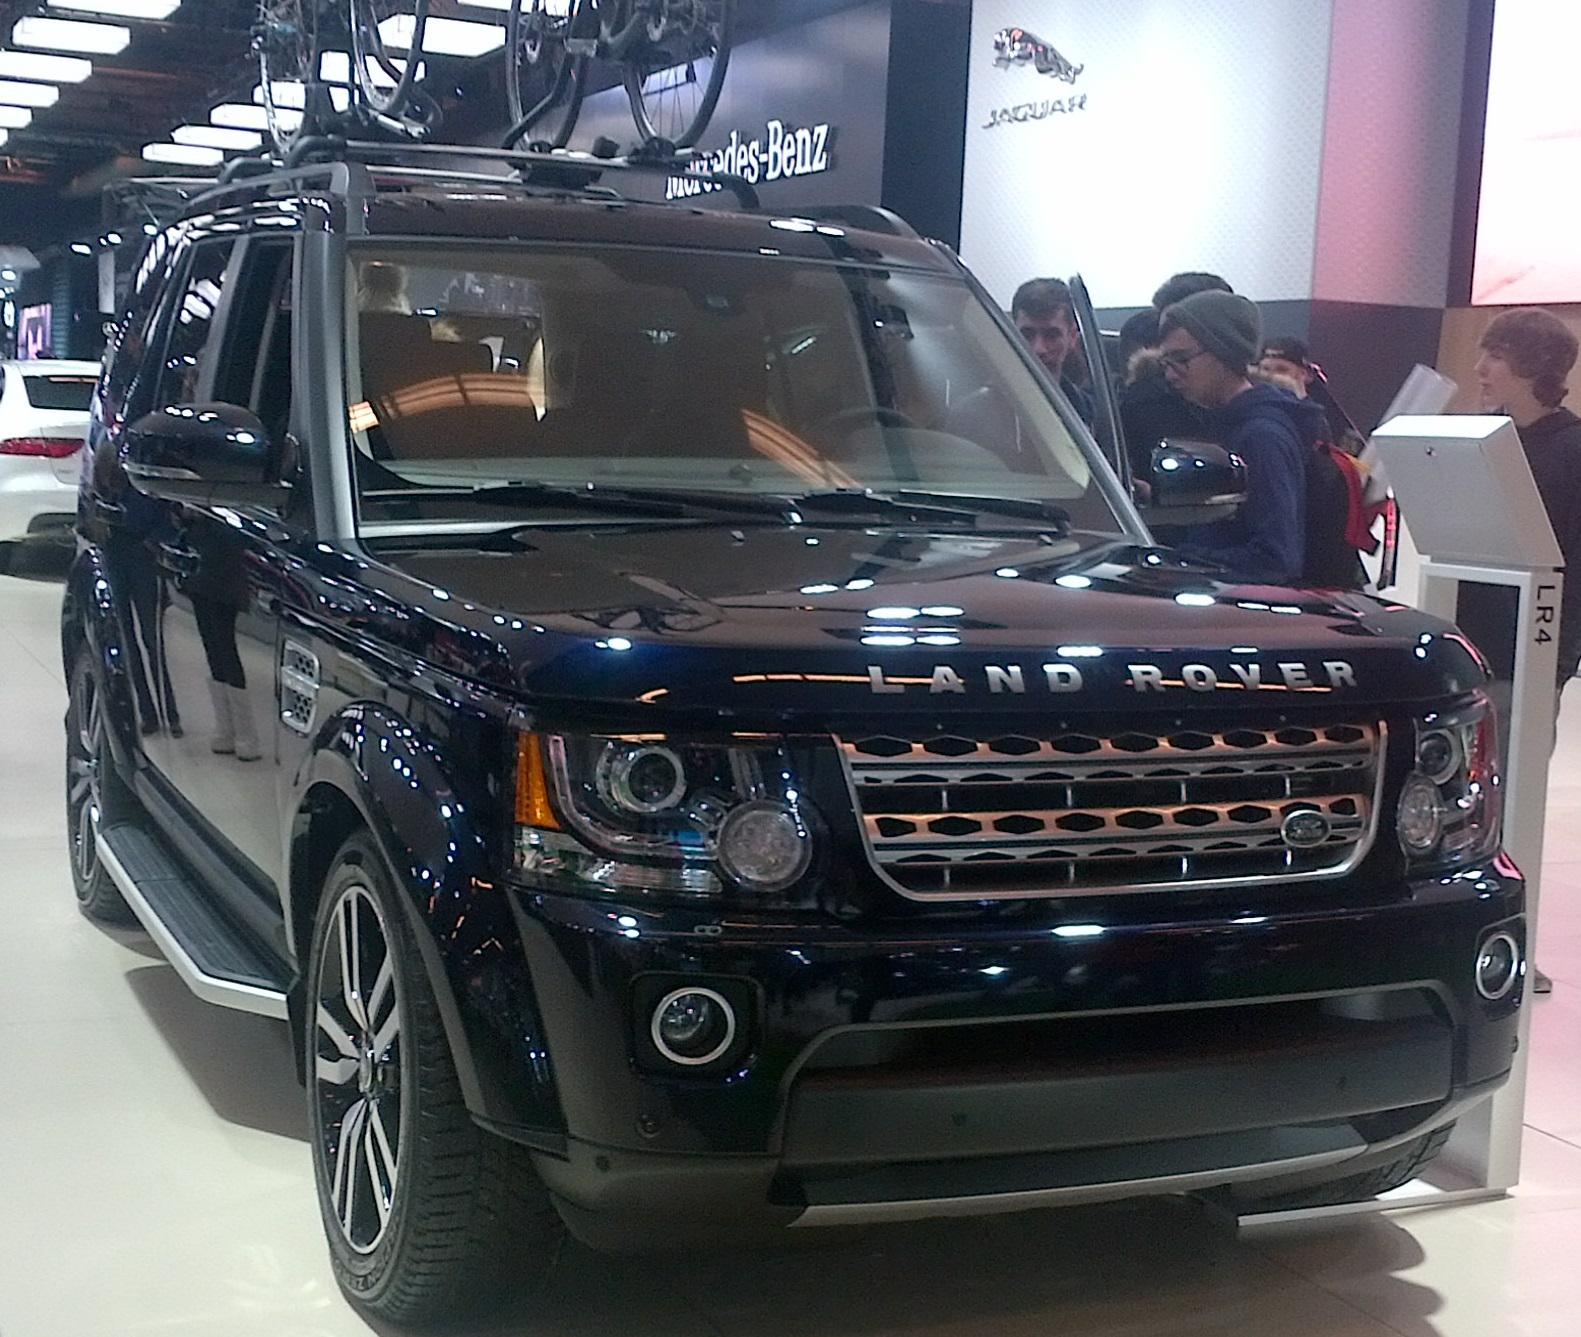 File:'16 Land Rover LR4 (MIAS '16).jpg